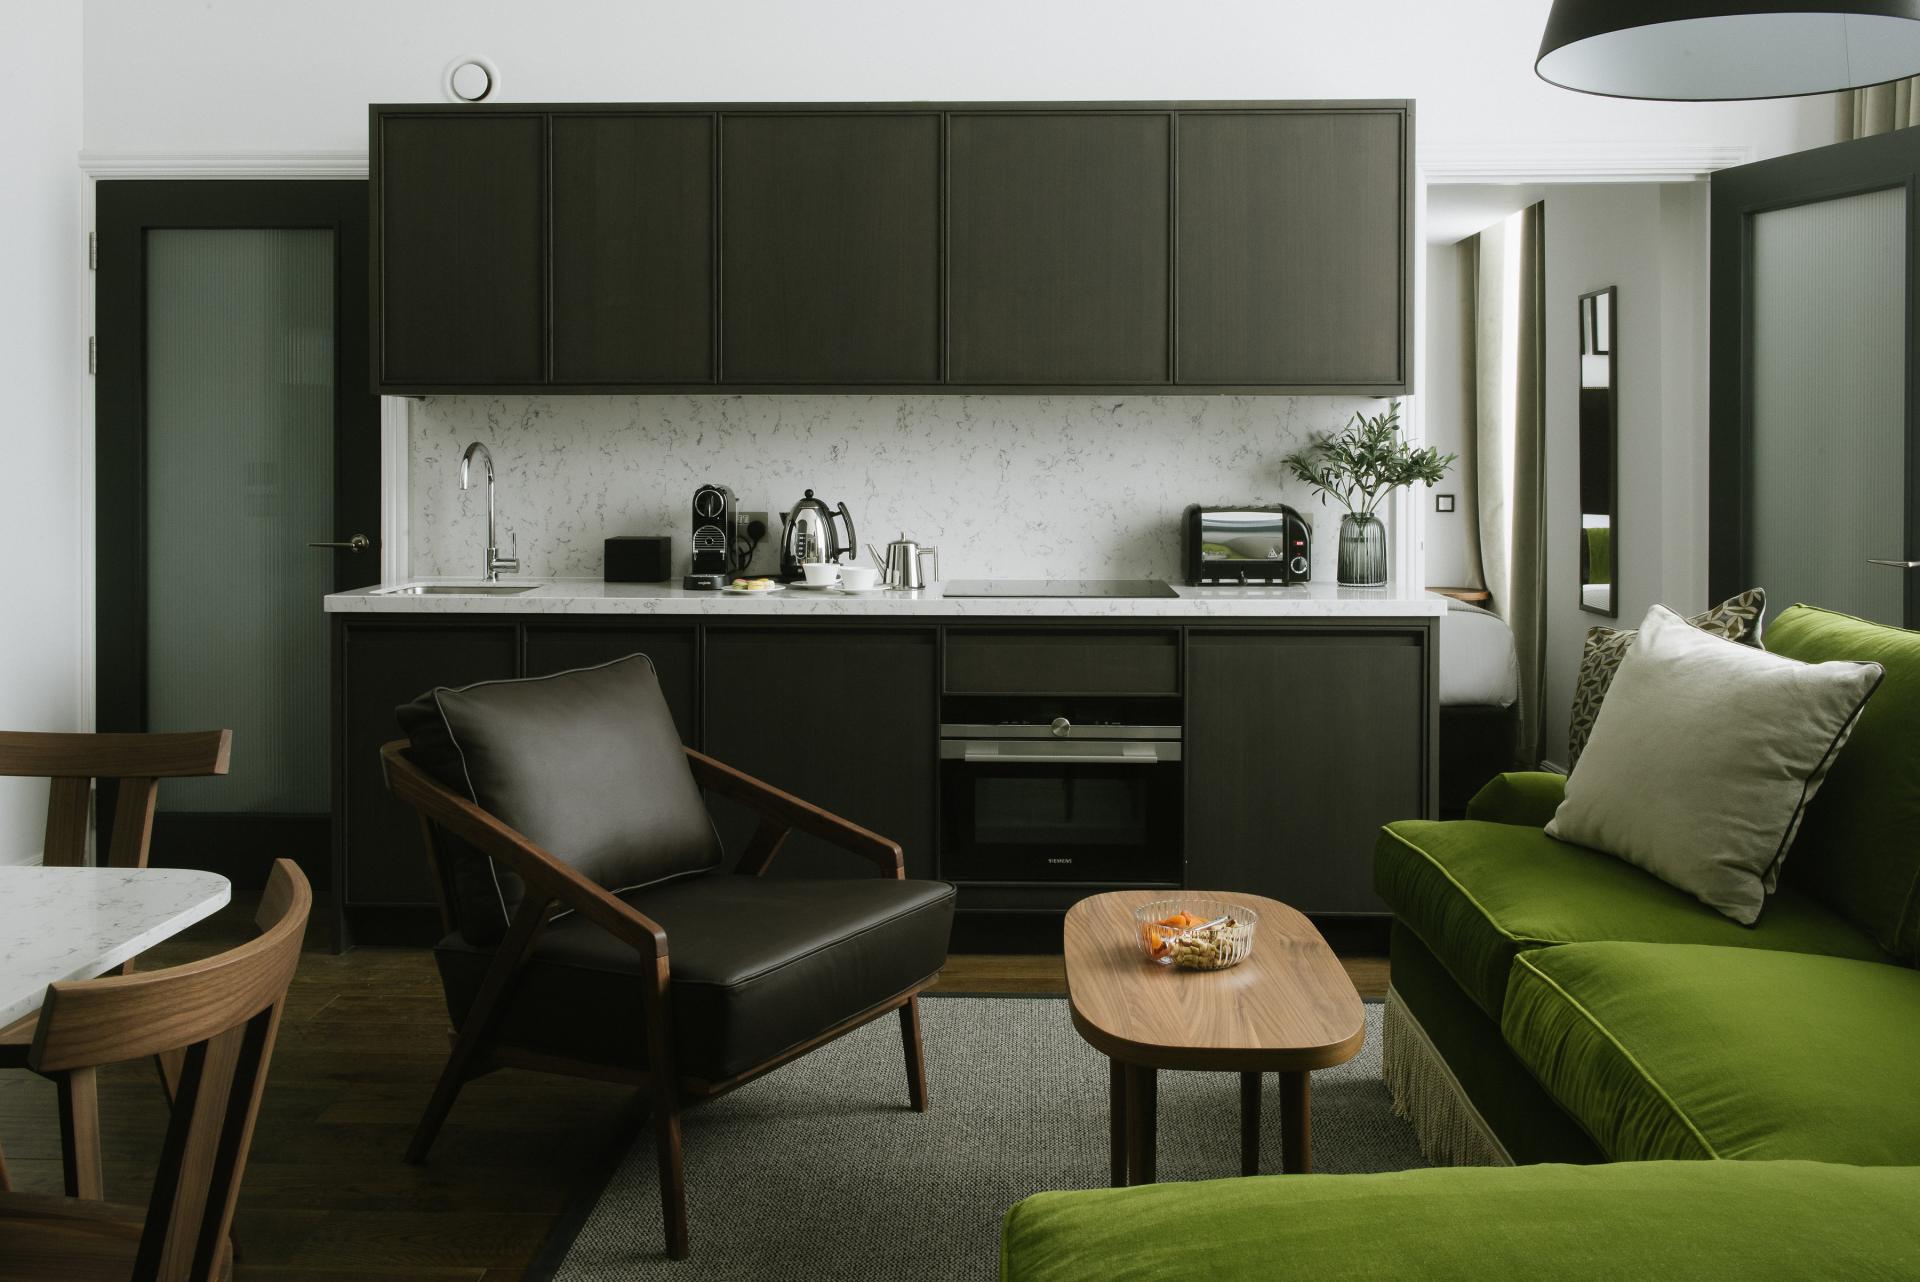 Kitchen at The Edinburgh Grand Apartments, Centre, Edinburgh - Citybase Apartments